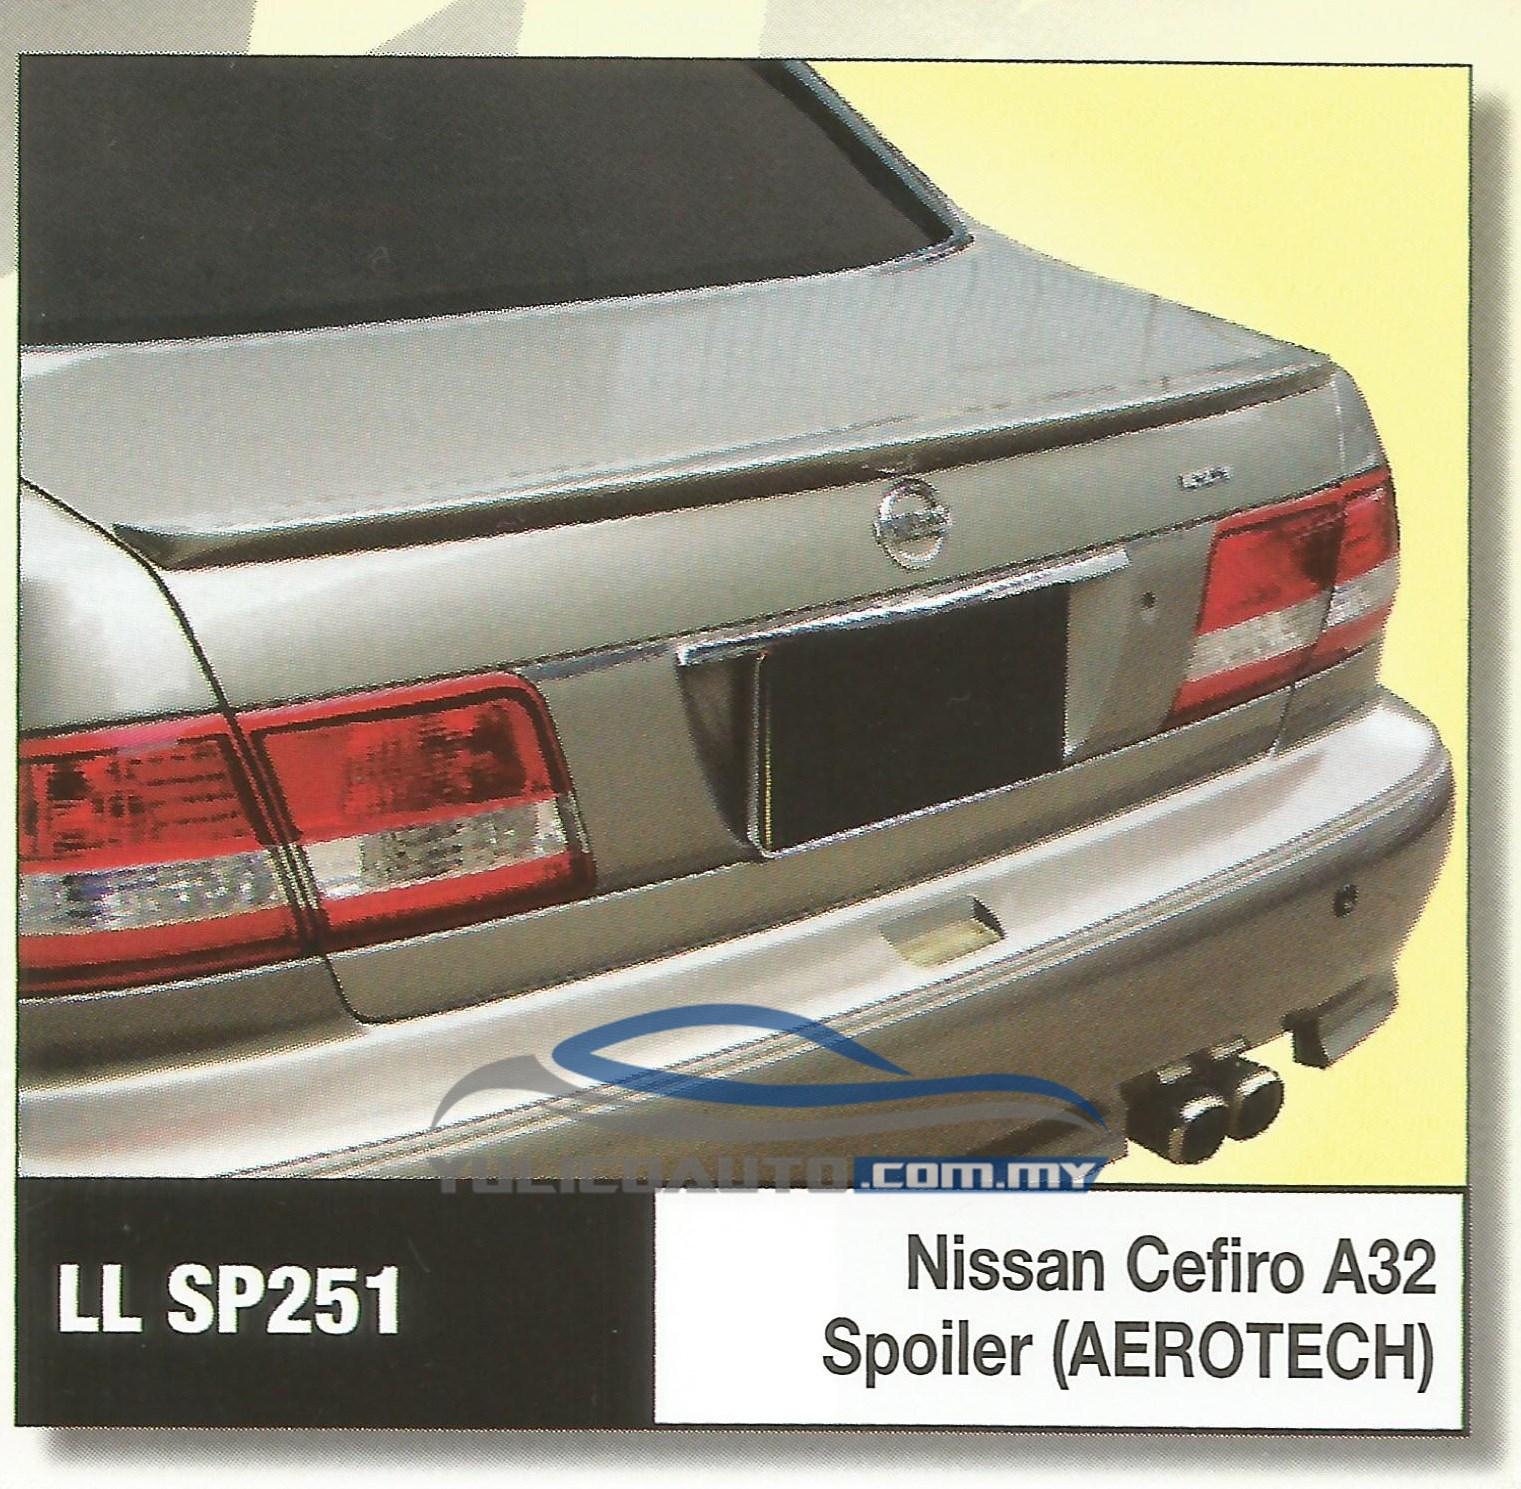 Buy Yulicoauto Nissan Cefiro A32 Spoiler Frp Eromman